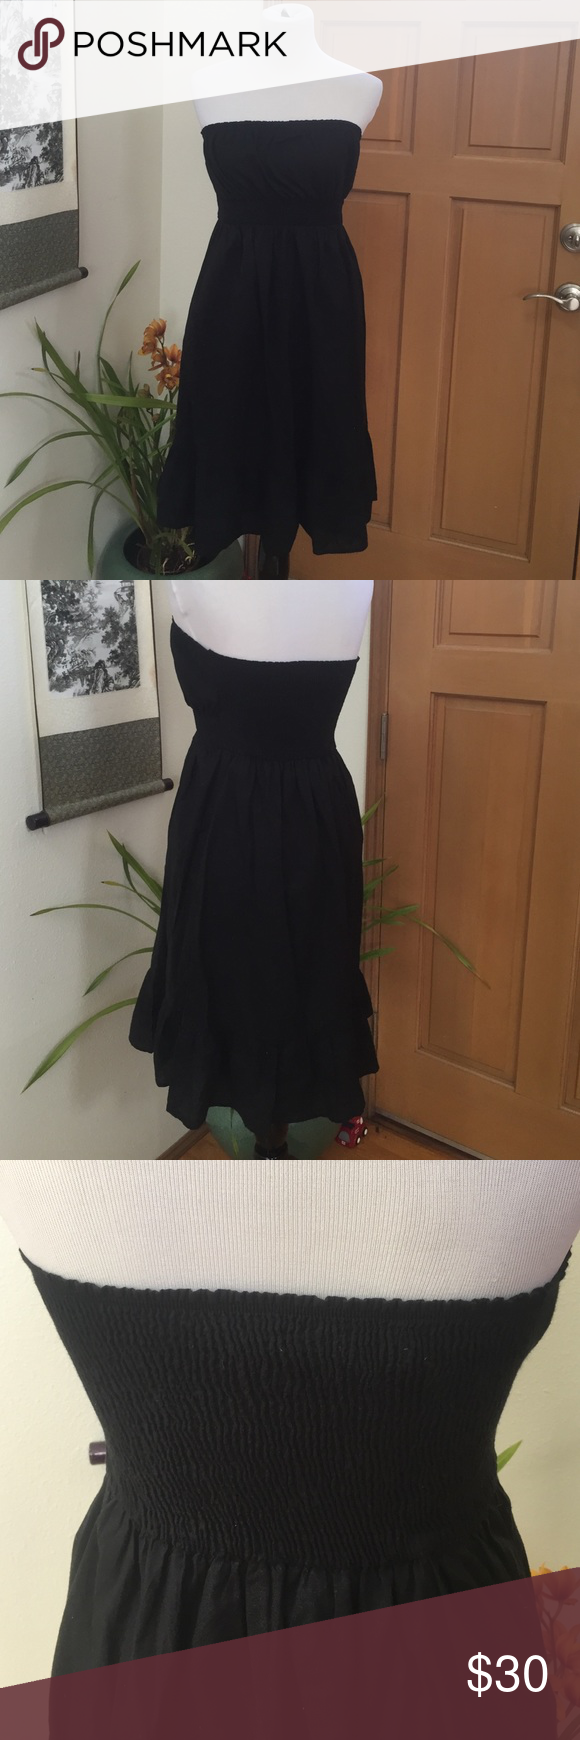 Anthropologie dress Black strapless fei brand for Anthropologie size medium dress that is 100% cotton Anthropologie Dresses Midi